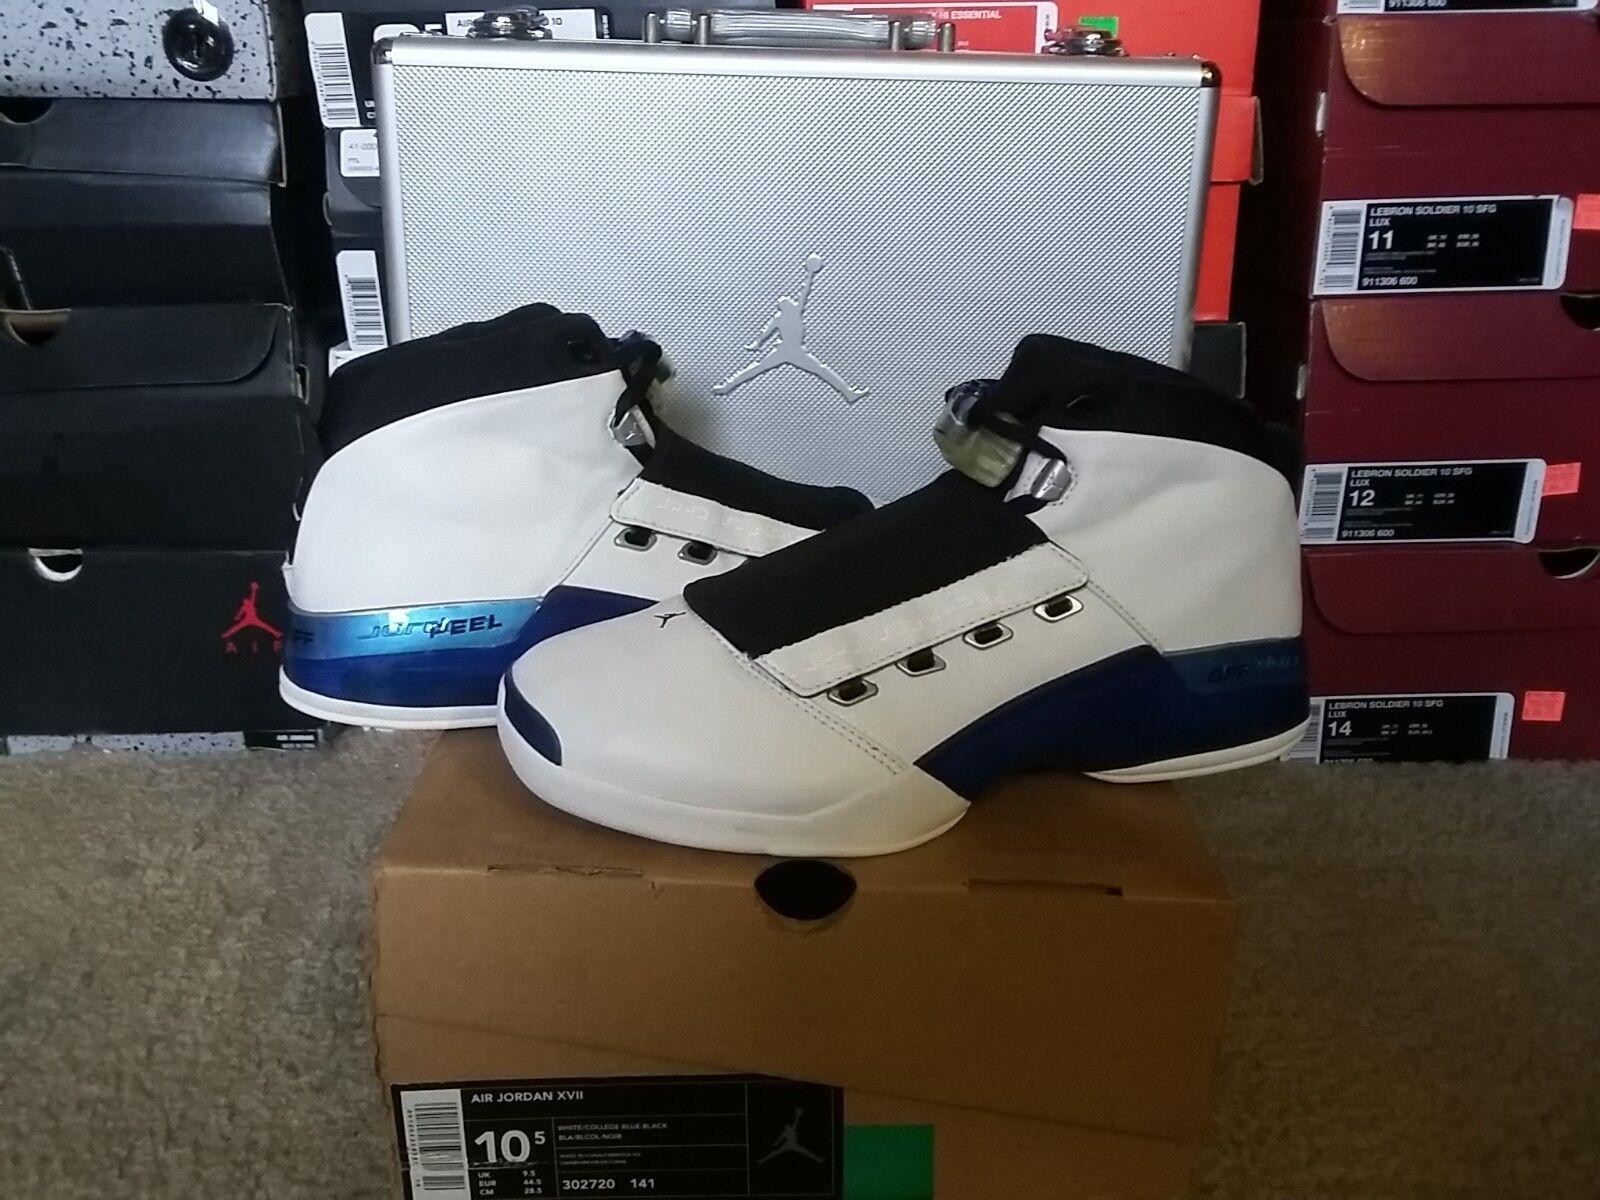 Nike Air Jordan XVII OG 2002 Retro Wizards White College bluee Black x 302720 141